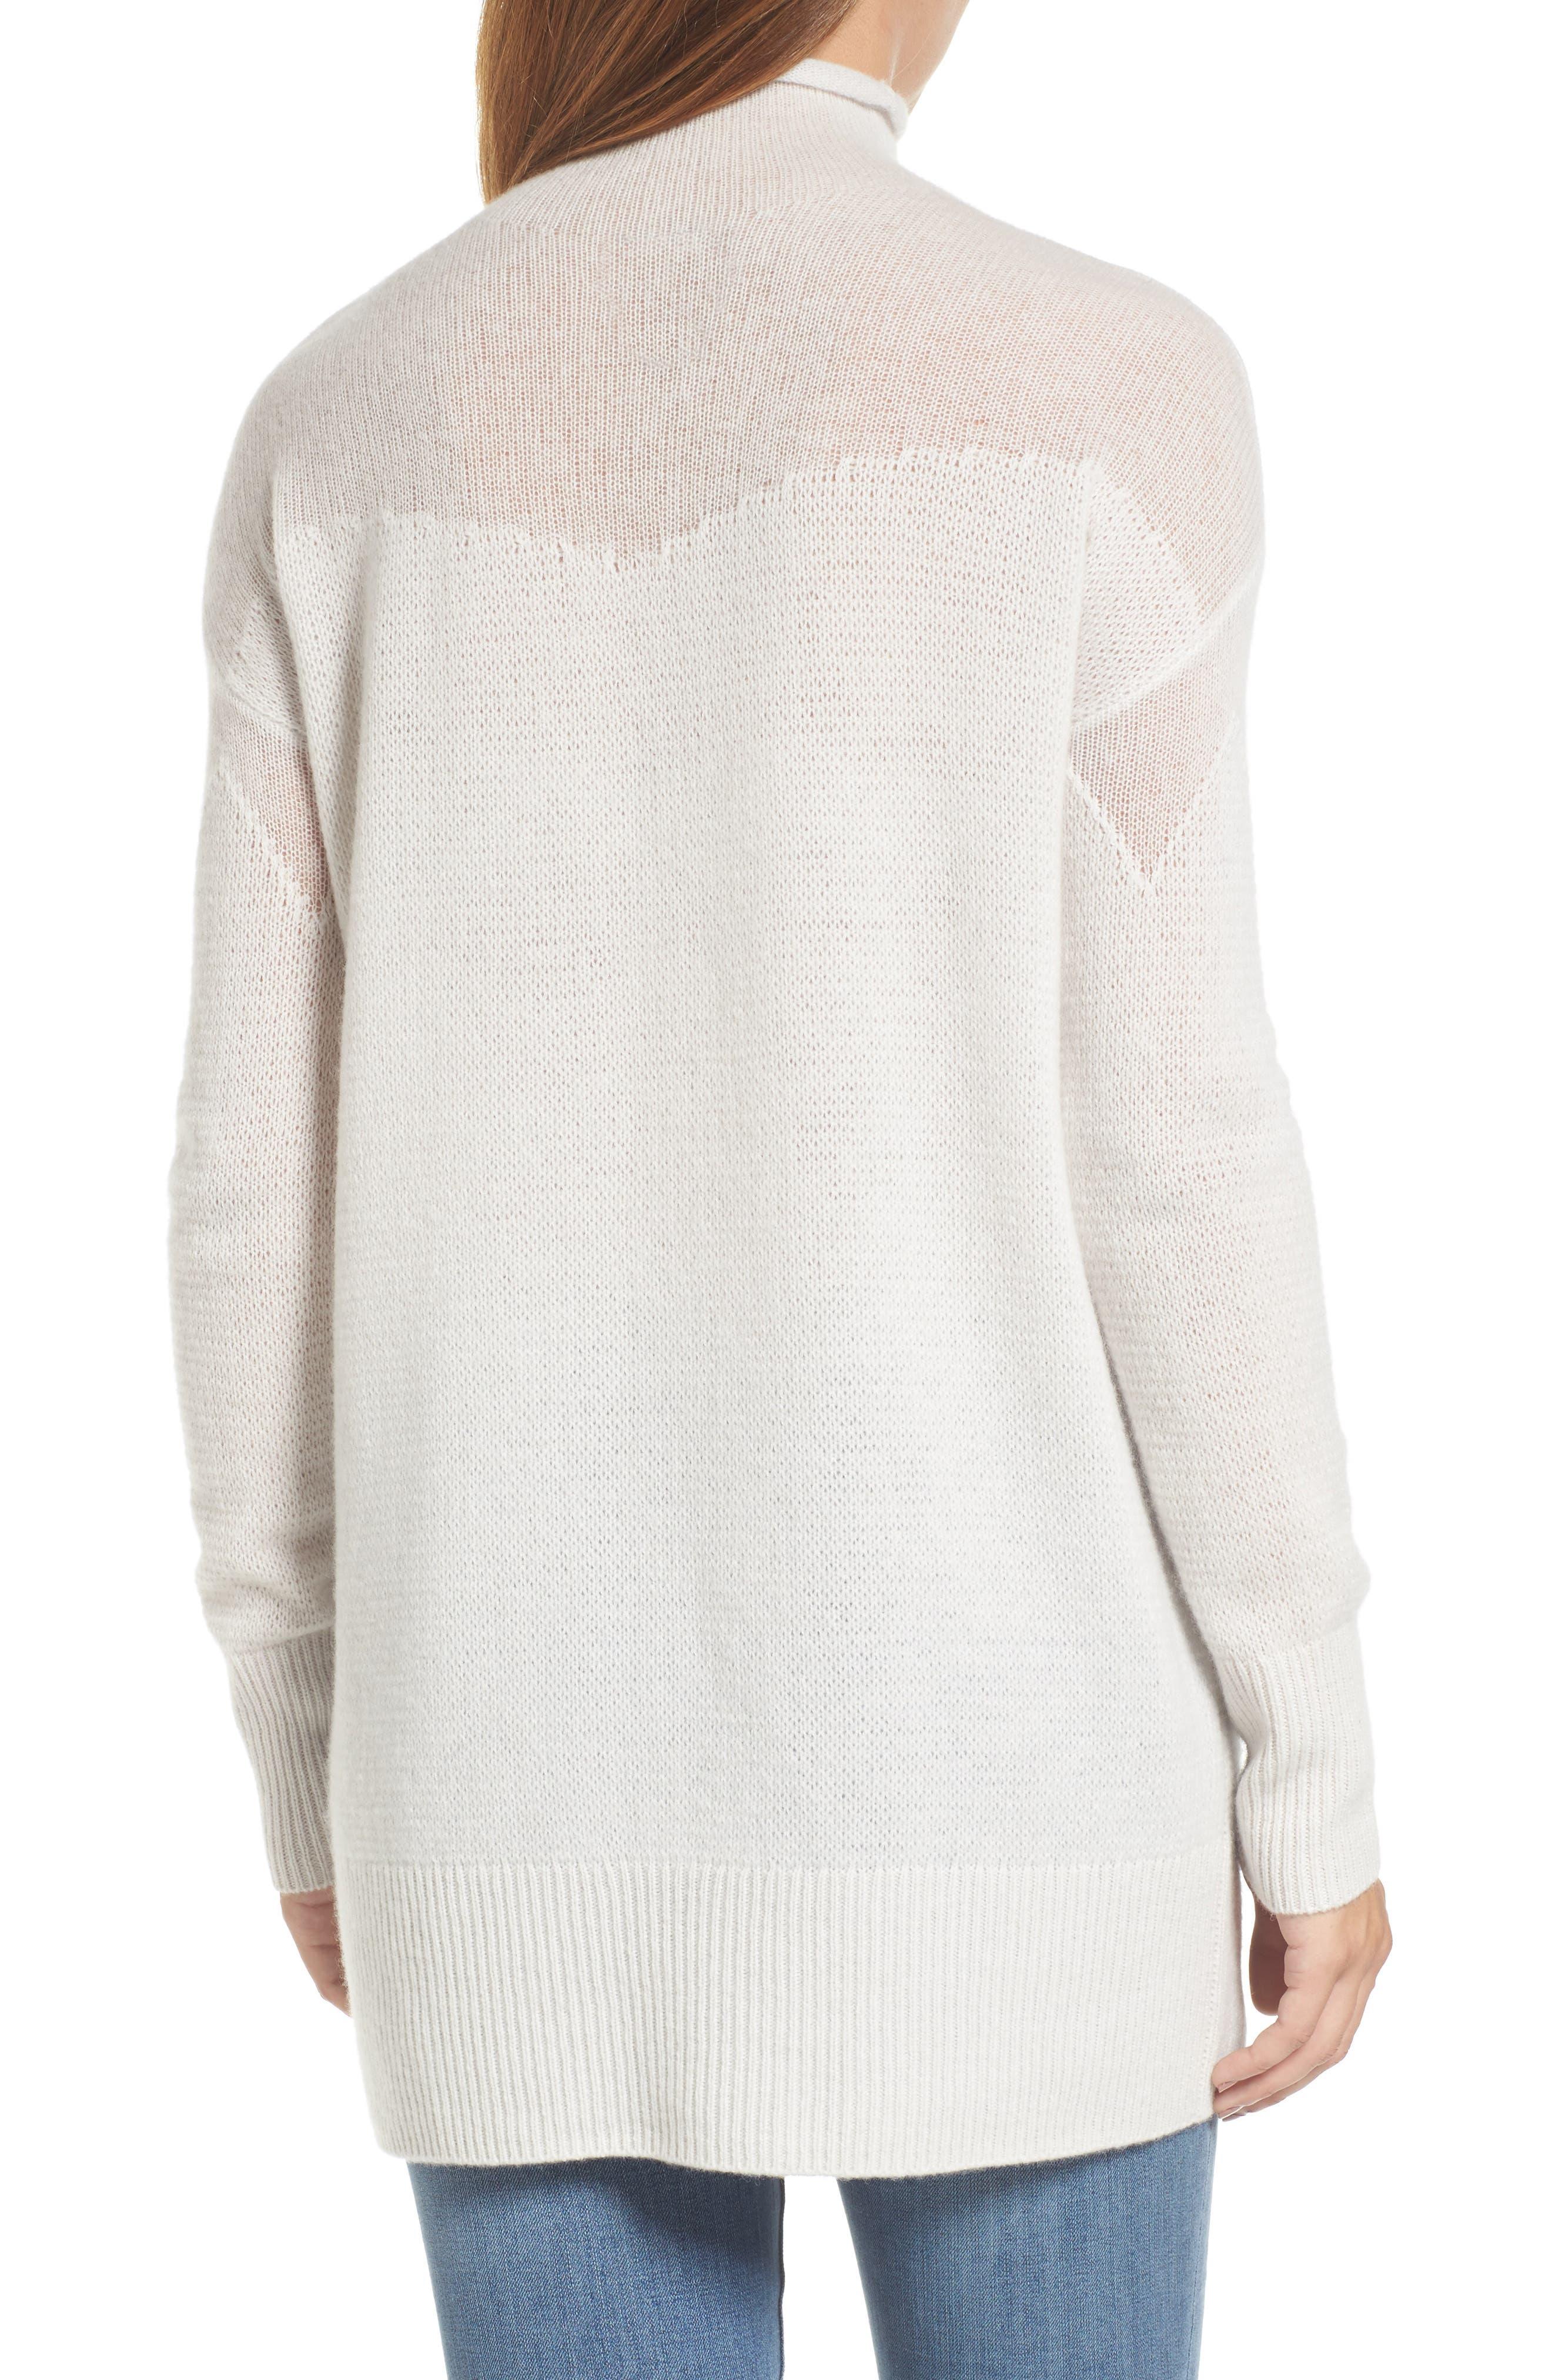 Alternate Image 2  - Halogen® Sheer Yoke Cashmere Sweater (Regular & Petite)